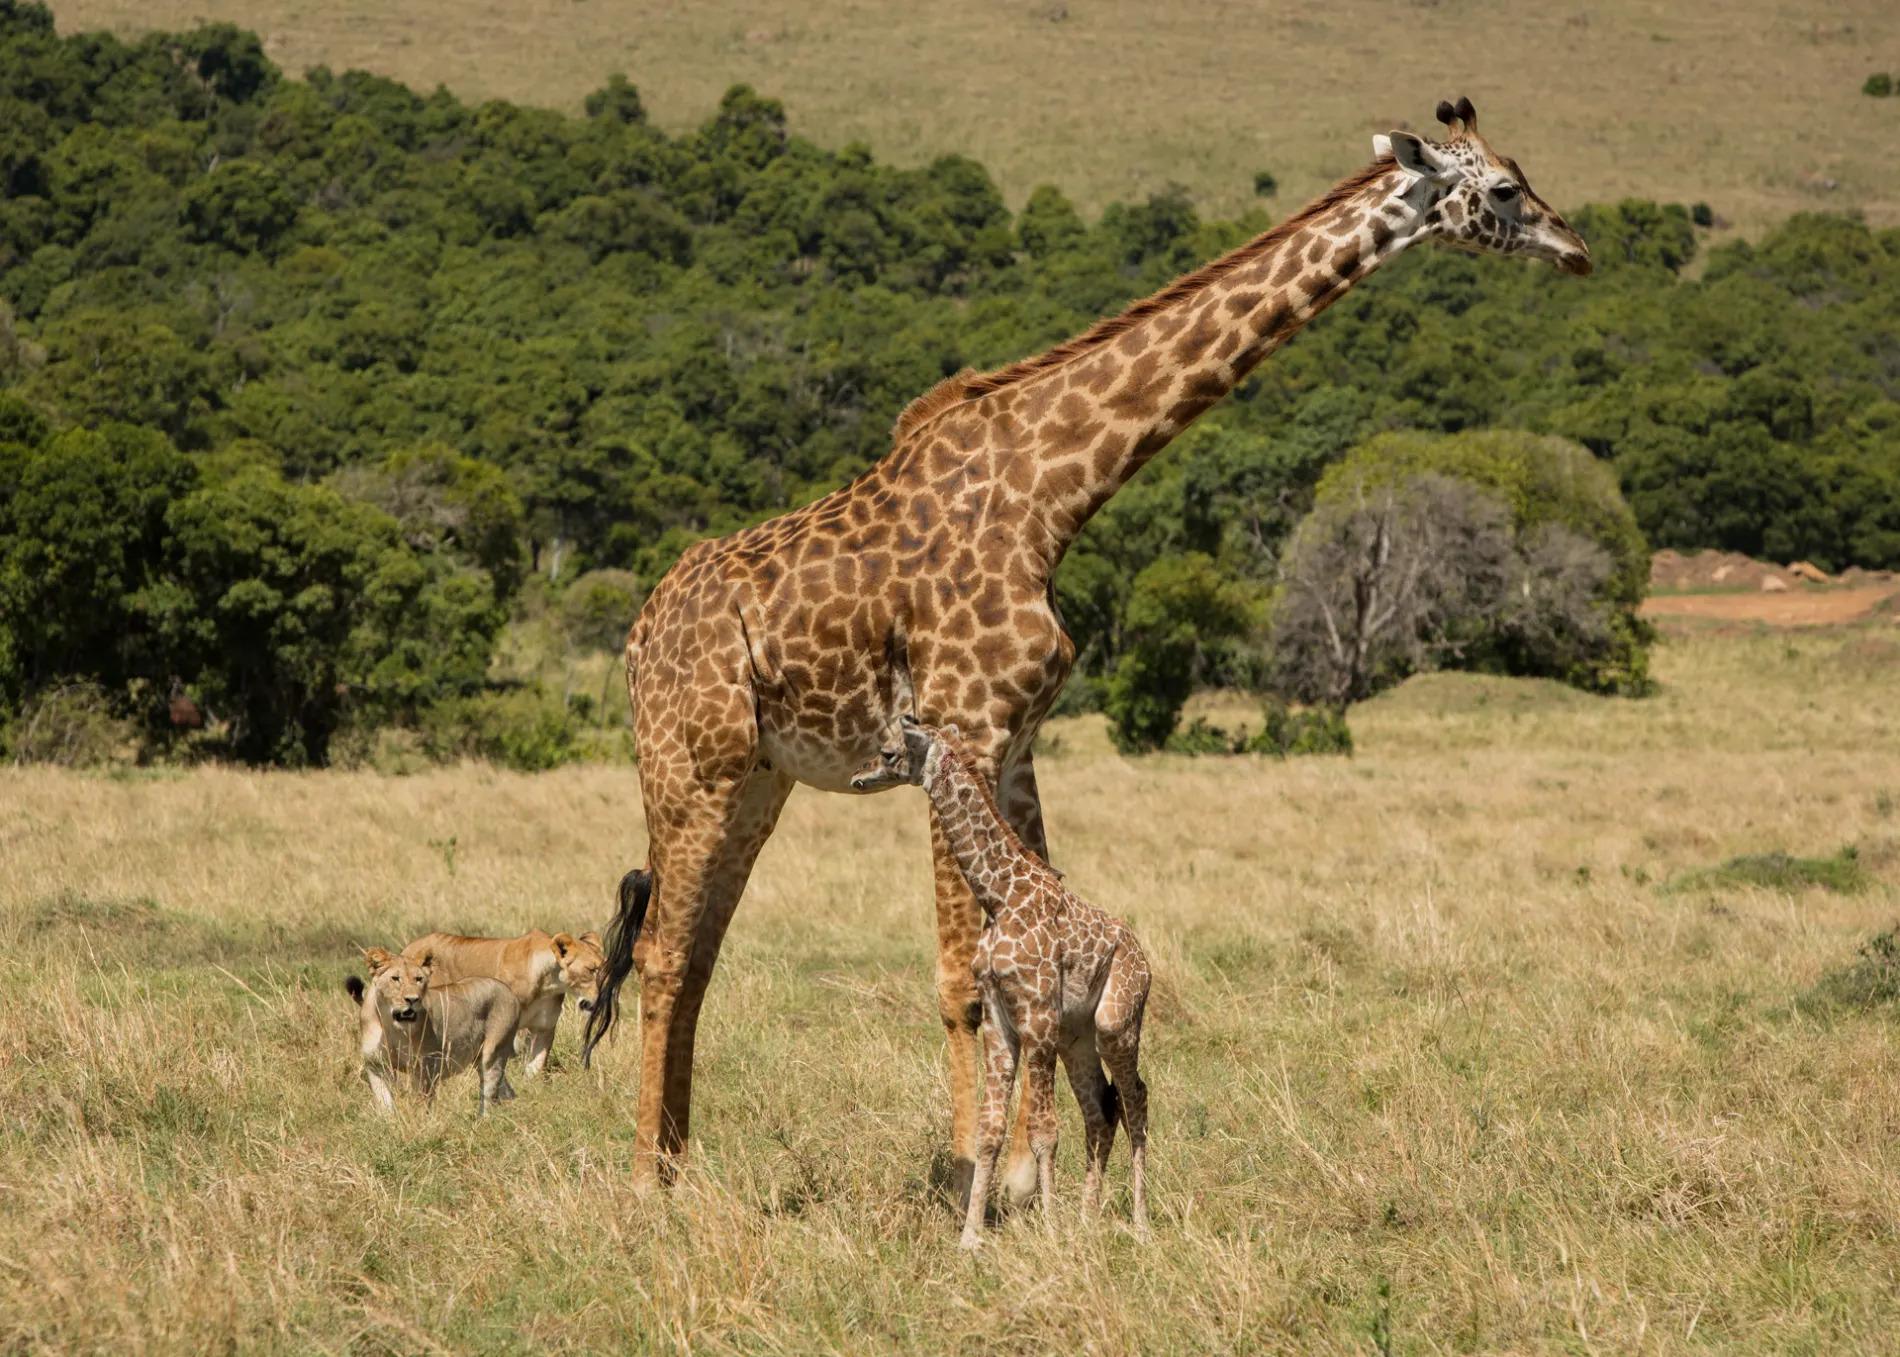 2 lionesses hunting baby giraffe